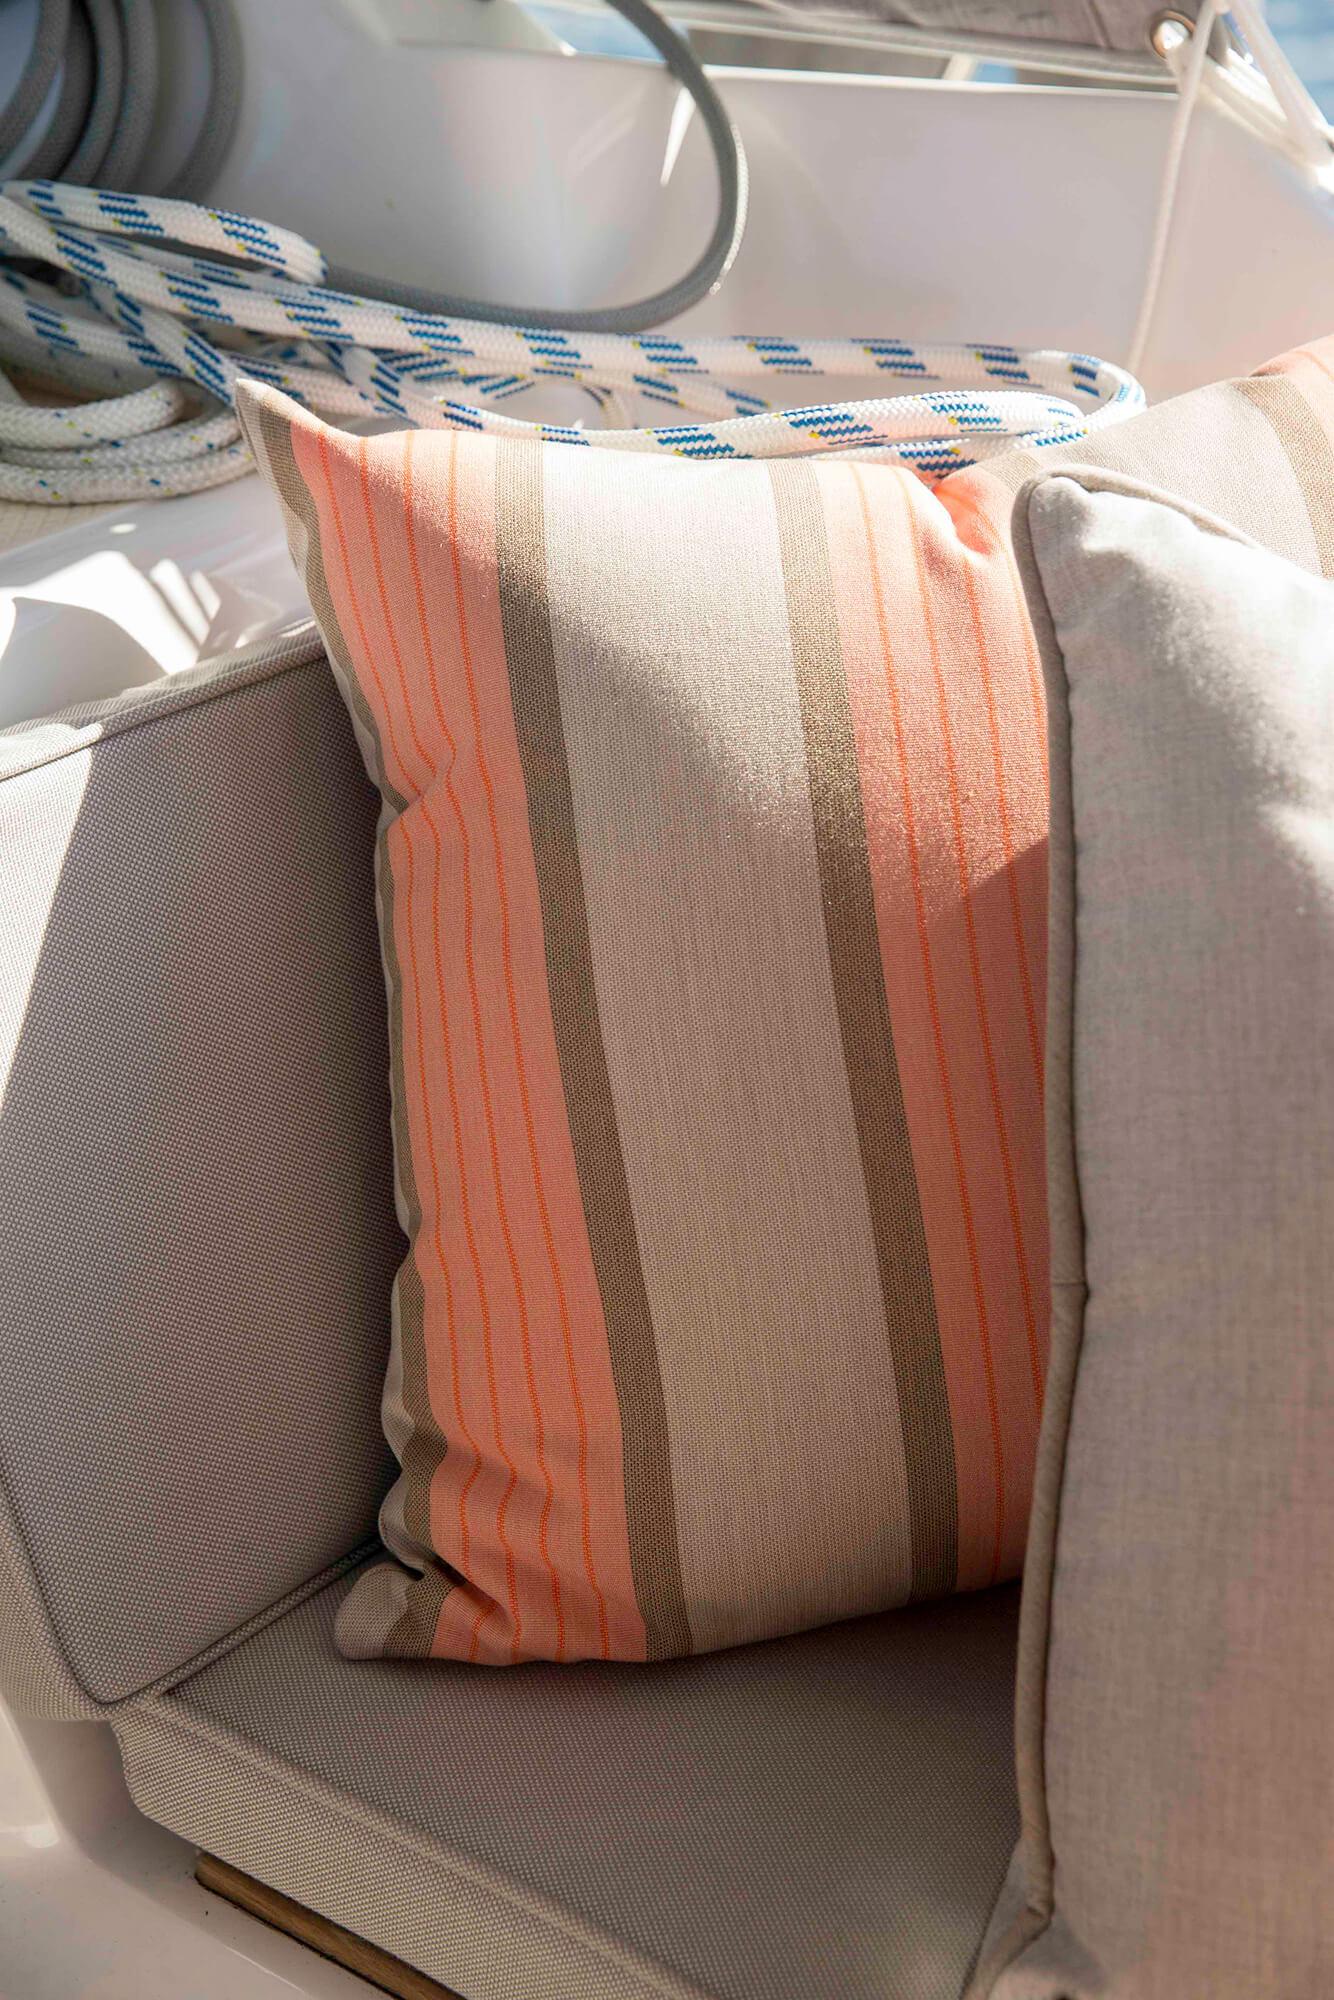 Sunbrella Cove Cameo 织物制成枕头的细节